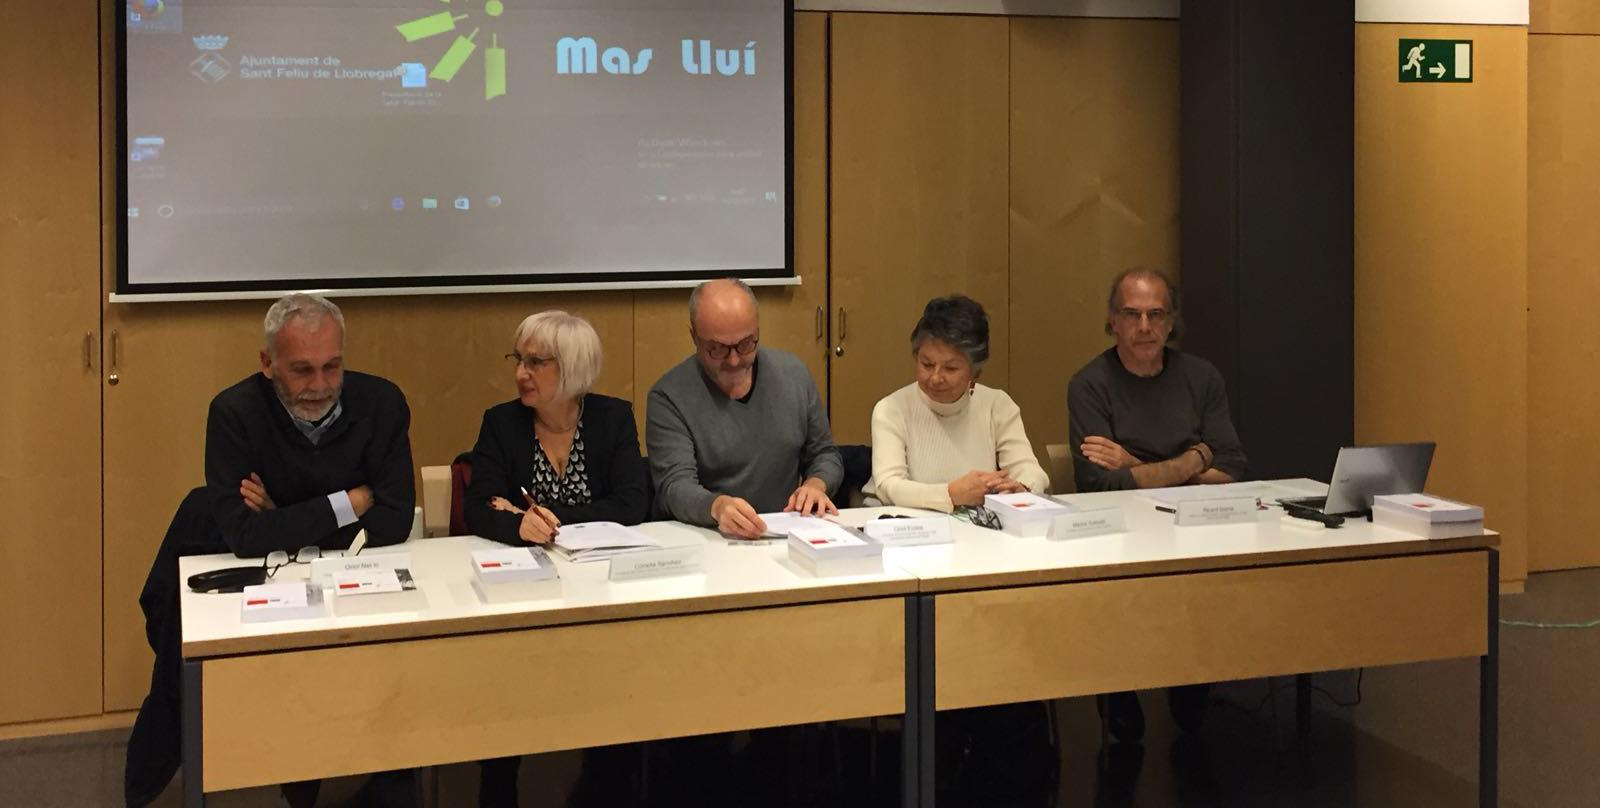 Oriol Nel·lo, Conxita Sánchez, Oriol Estela, Marina Subirats, Ricard Gomà